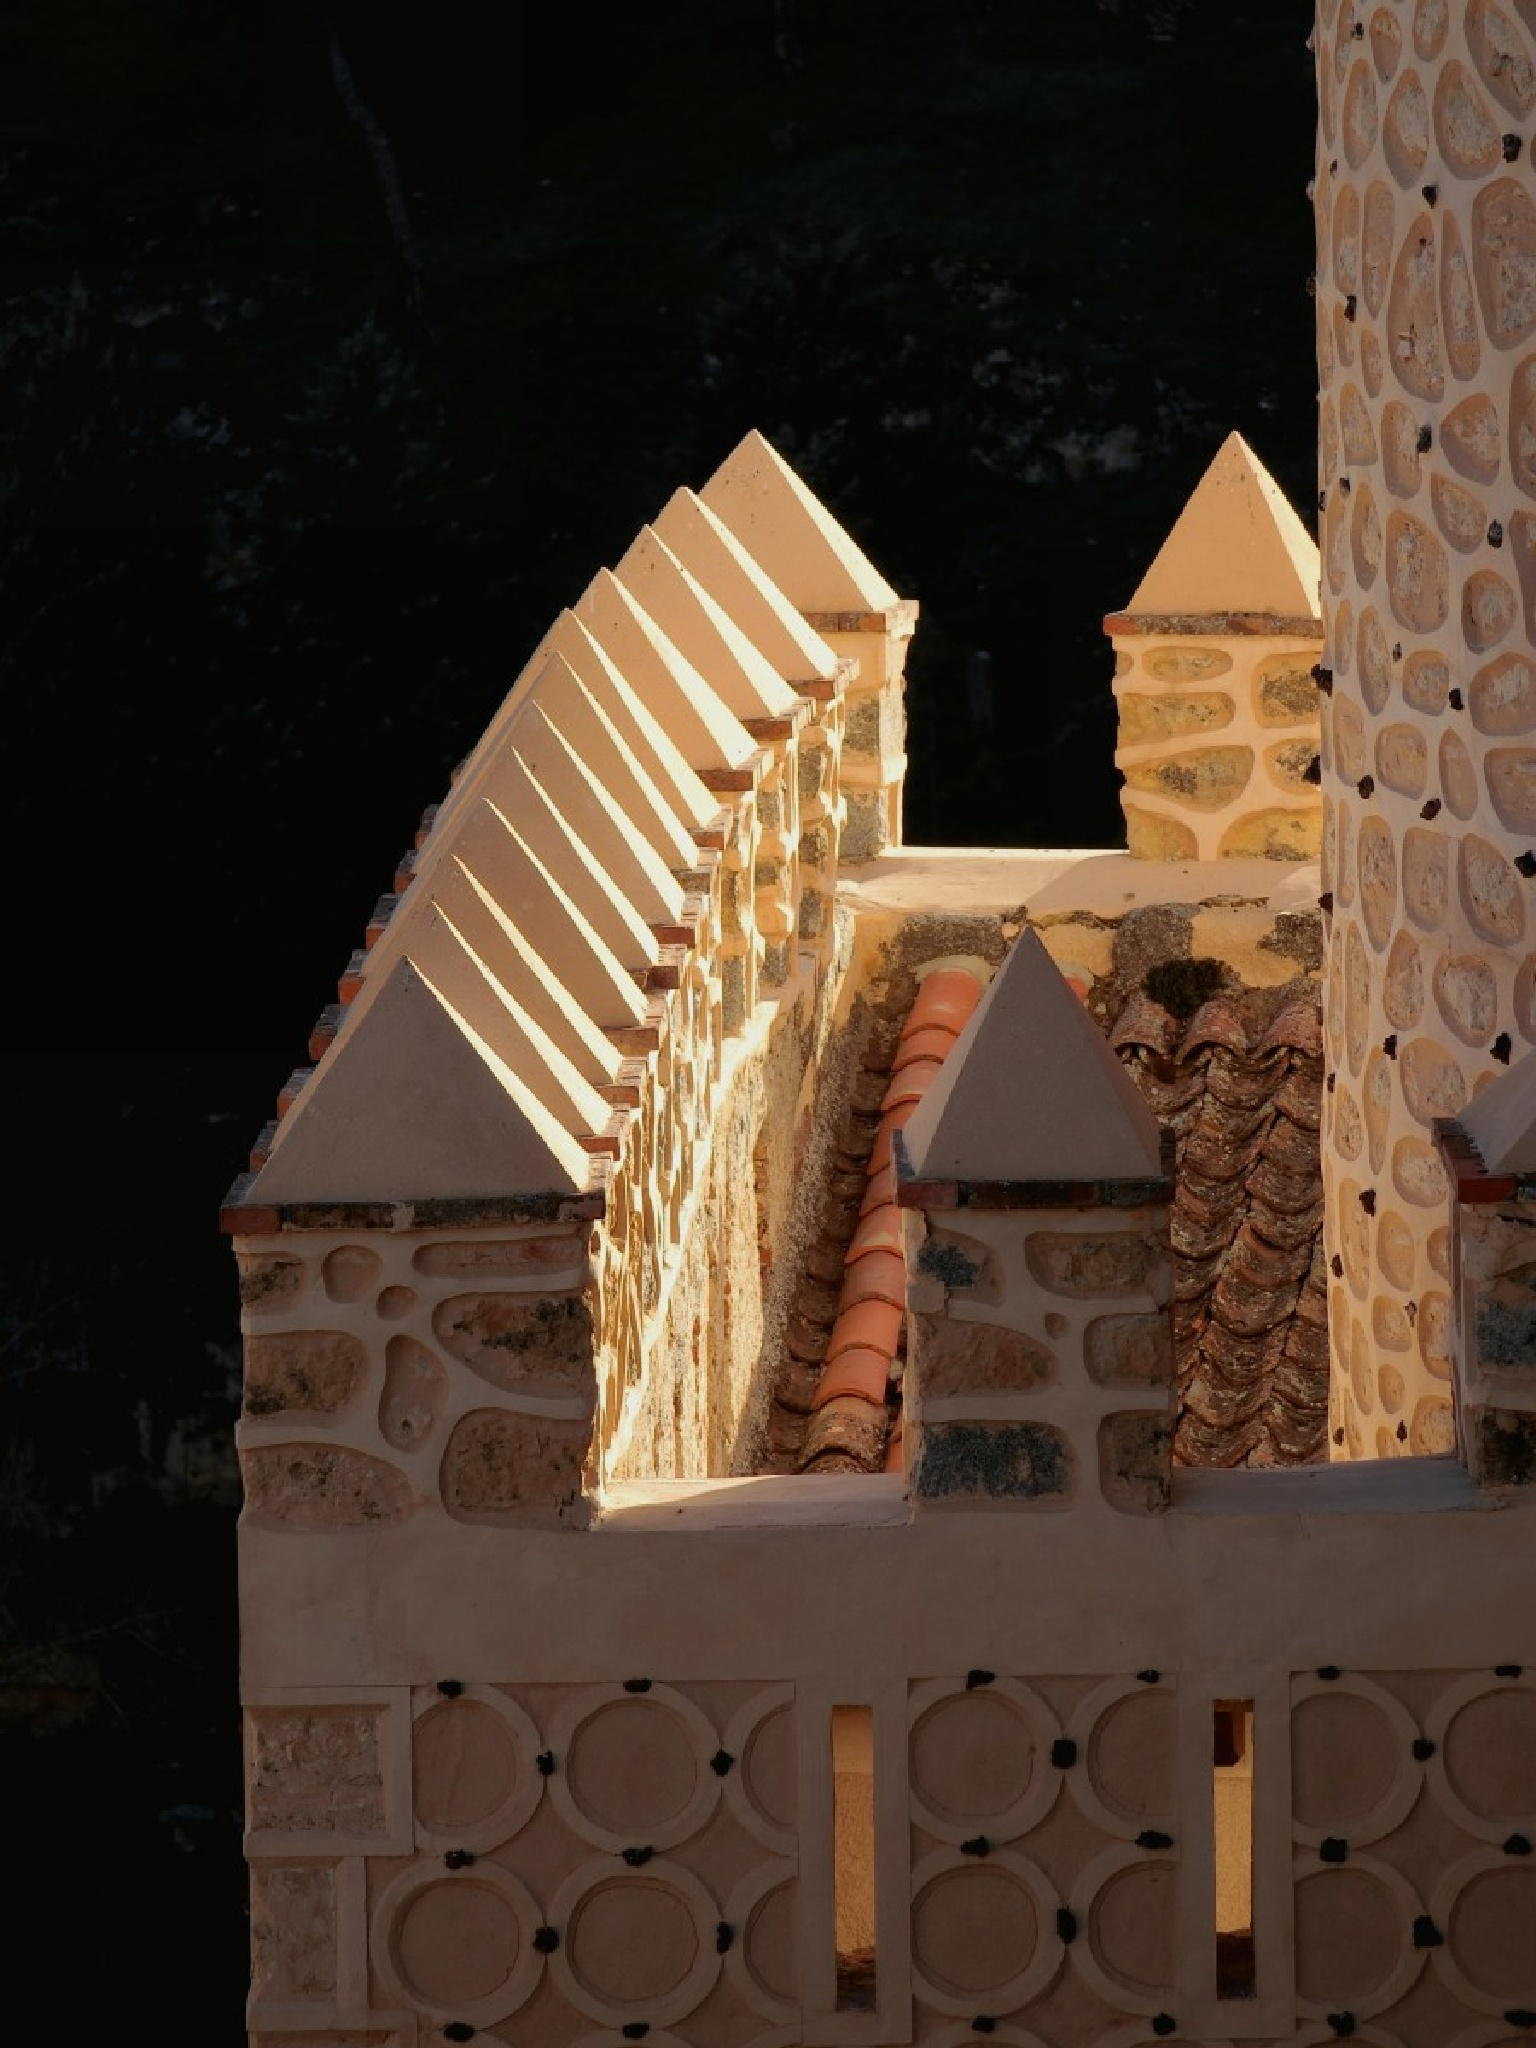 Alcazar de Segovia, Spain by pop88123